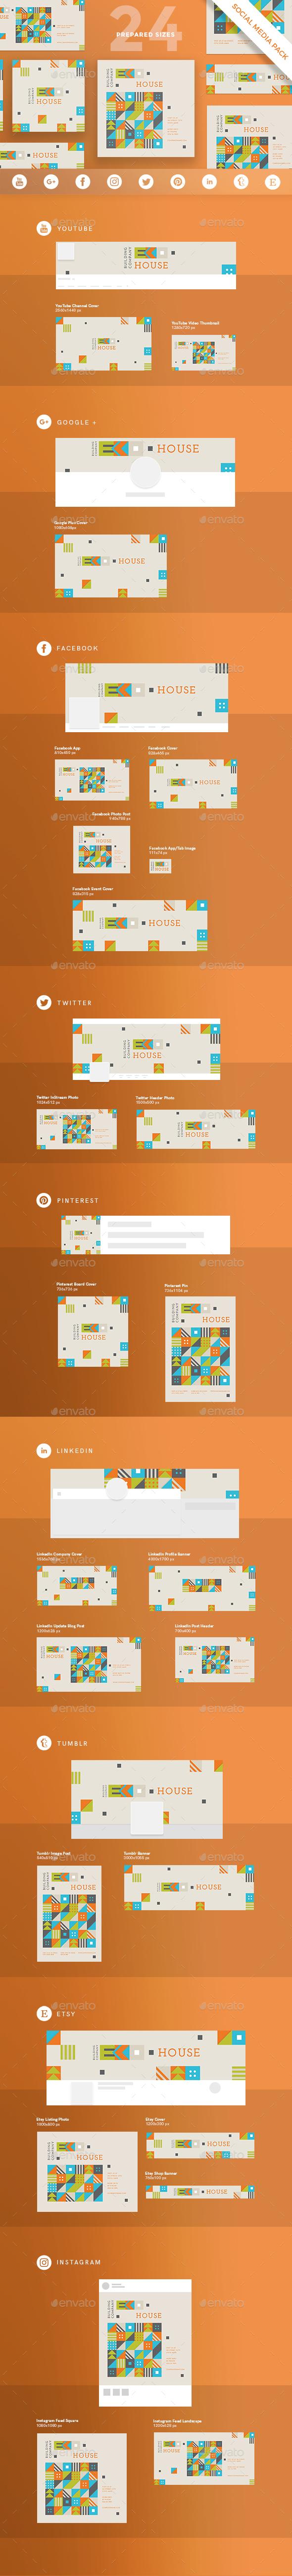 Eco House Social Media Pack - Miscellaneous Social Media